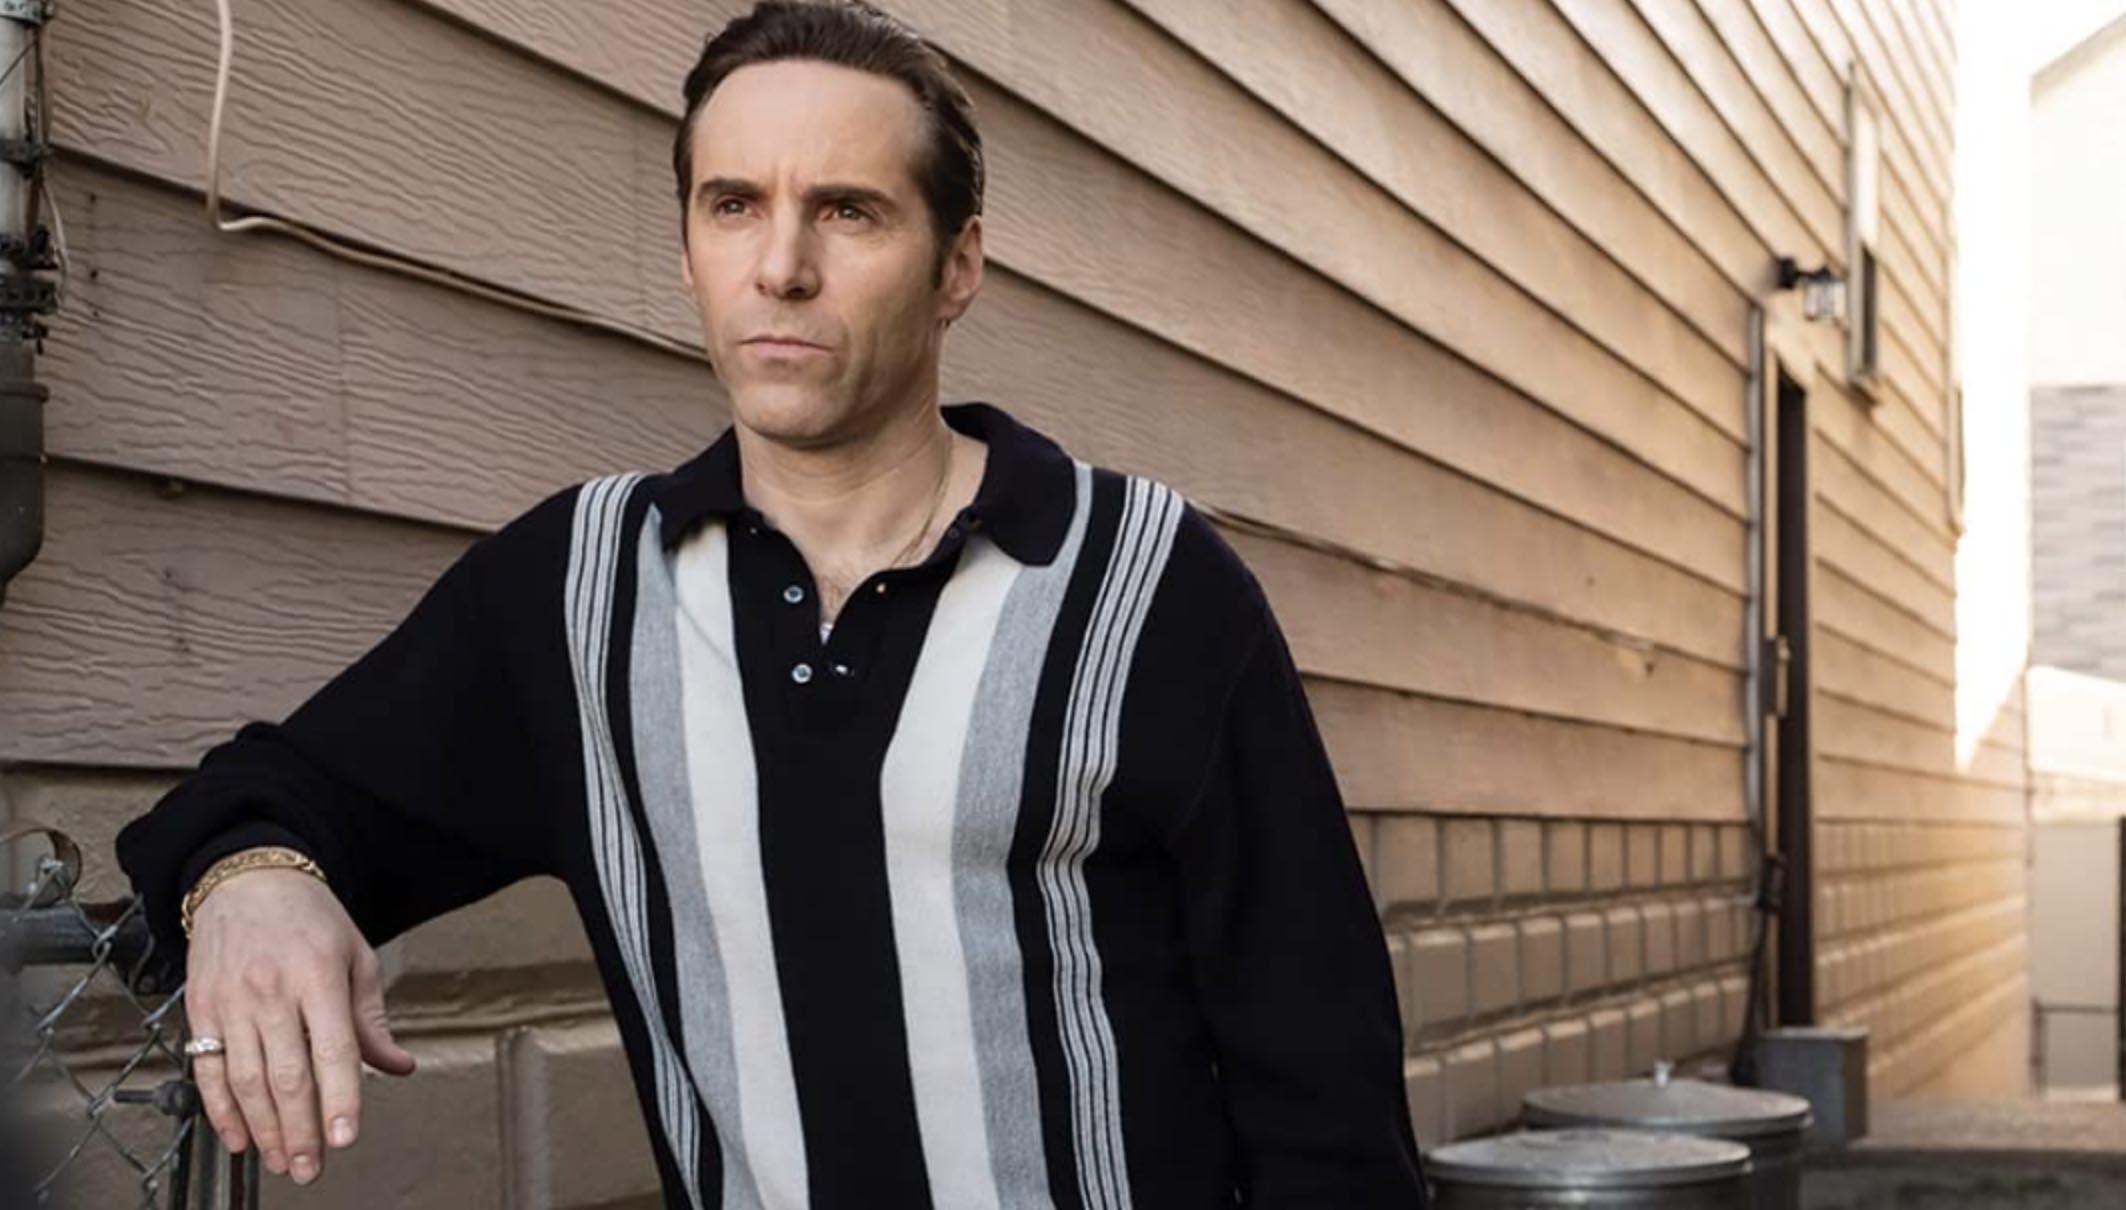 Alessandro Nivola har hovedrollen i The Many Saints of Newark som onkel Dickie Moltisanti (Warner Bros.)